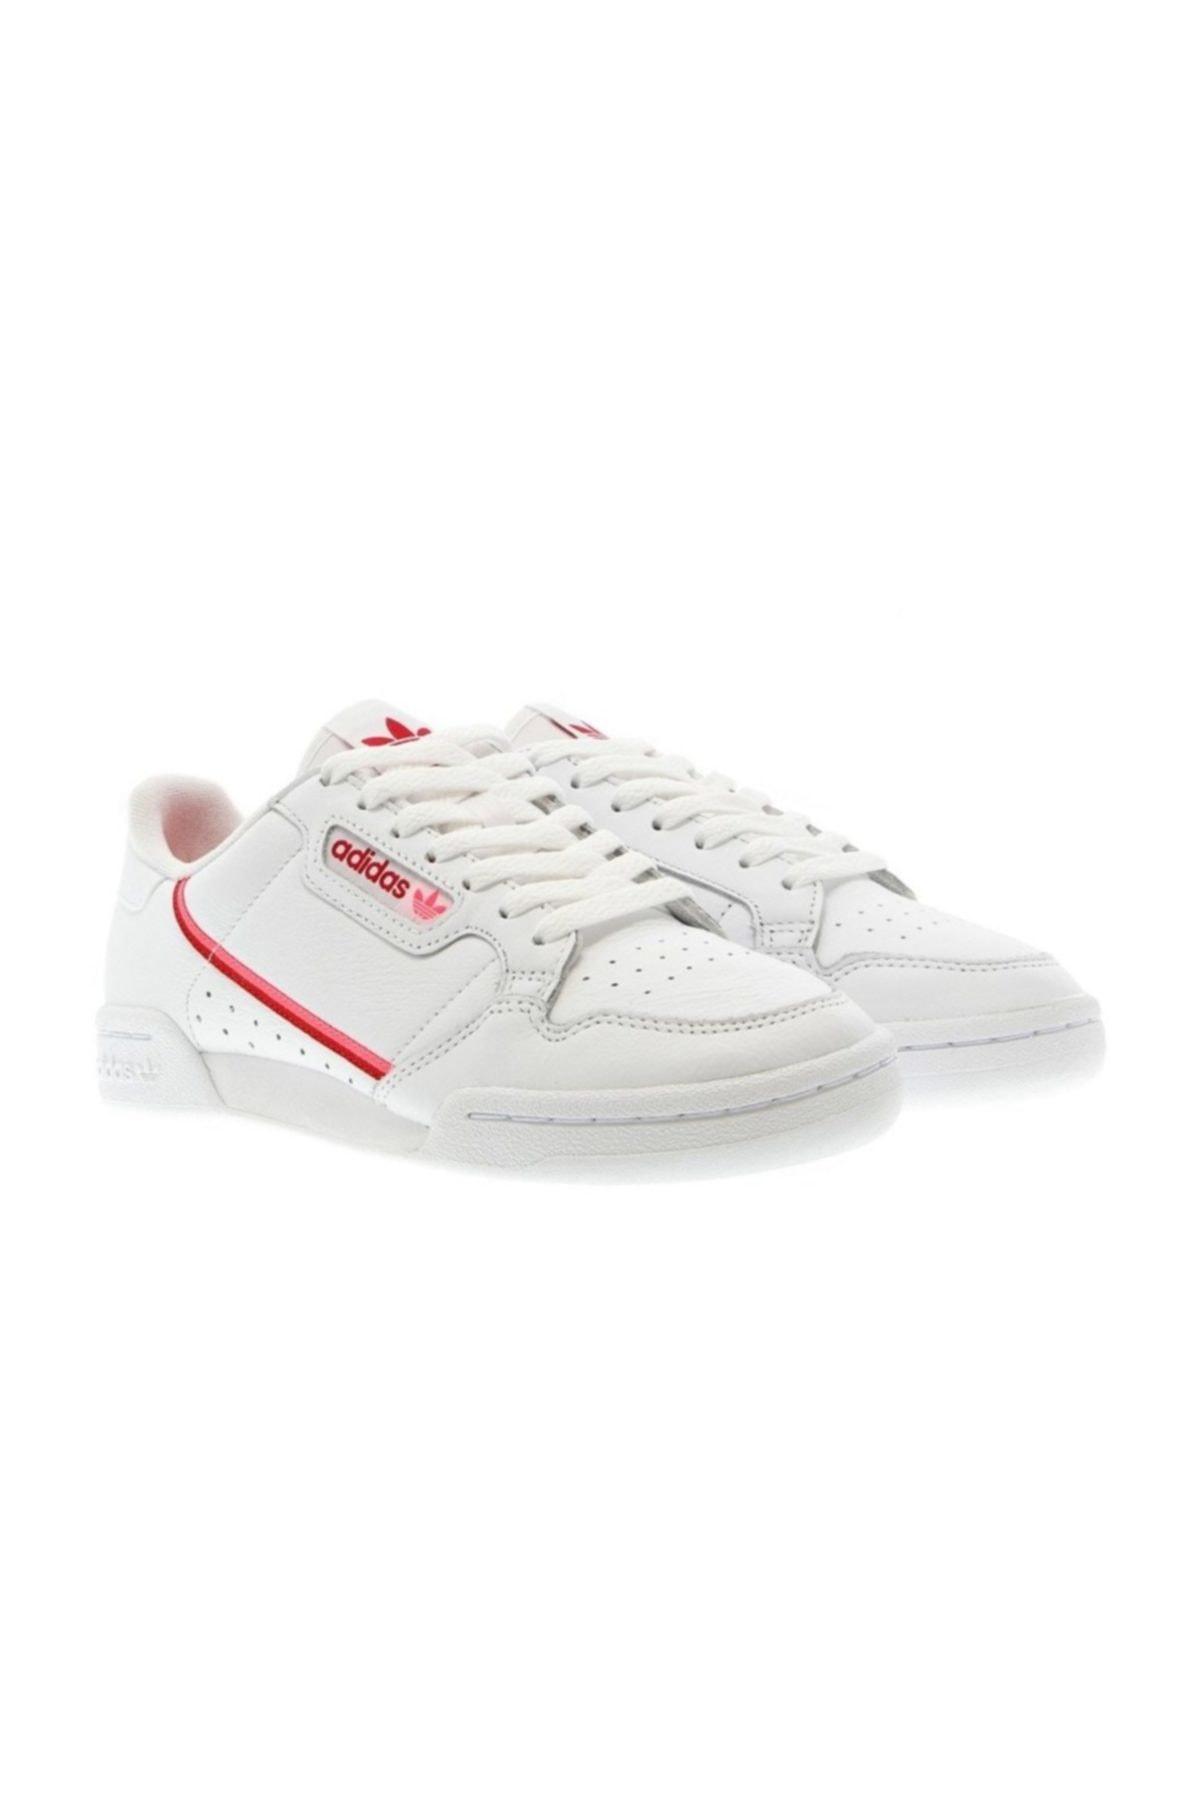 adidas CONTINENTAL 80 W Kadın Spor Ayakkabı 1